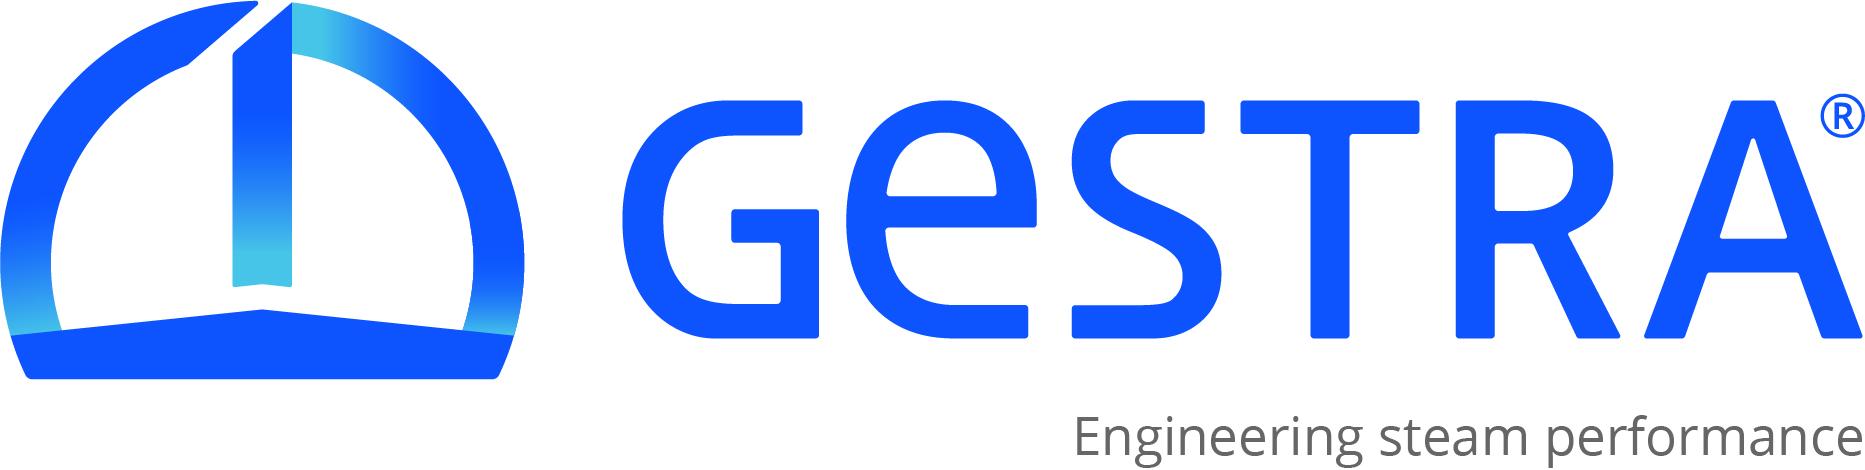 Logo Italgestra